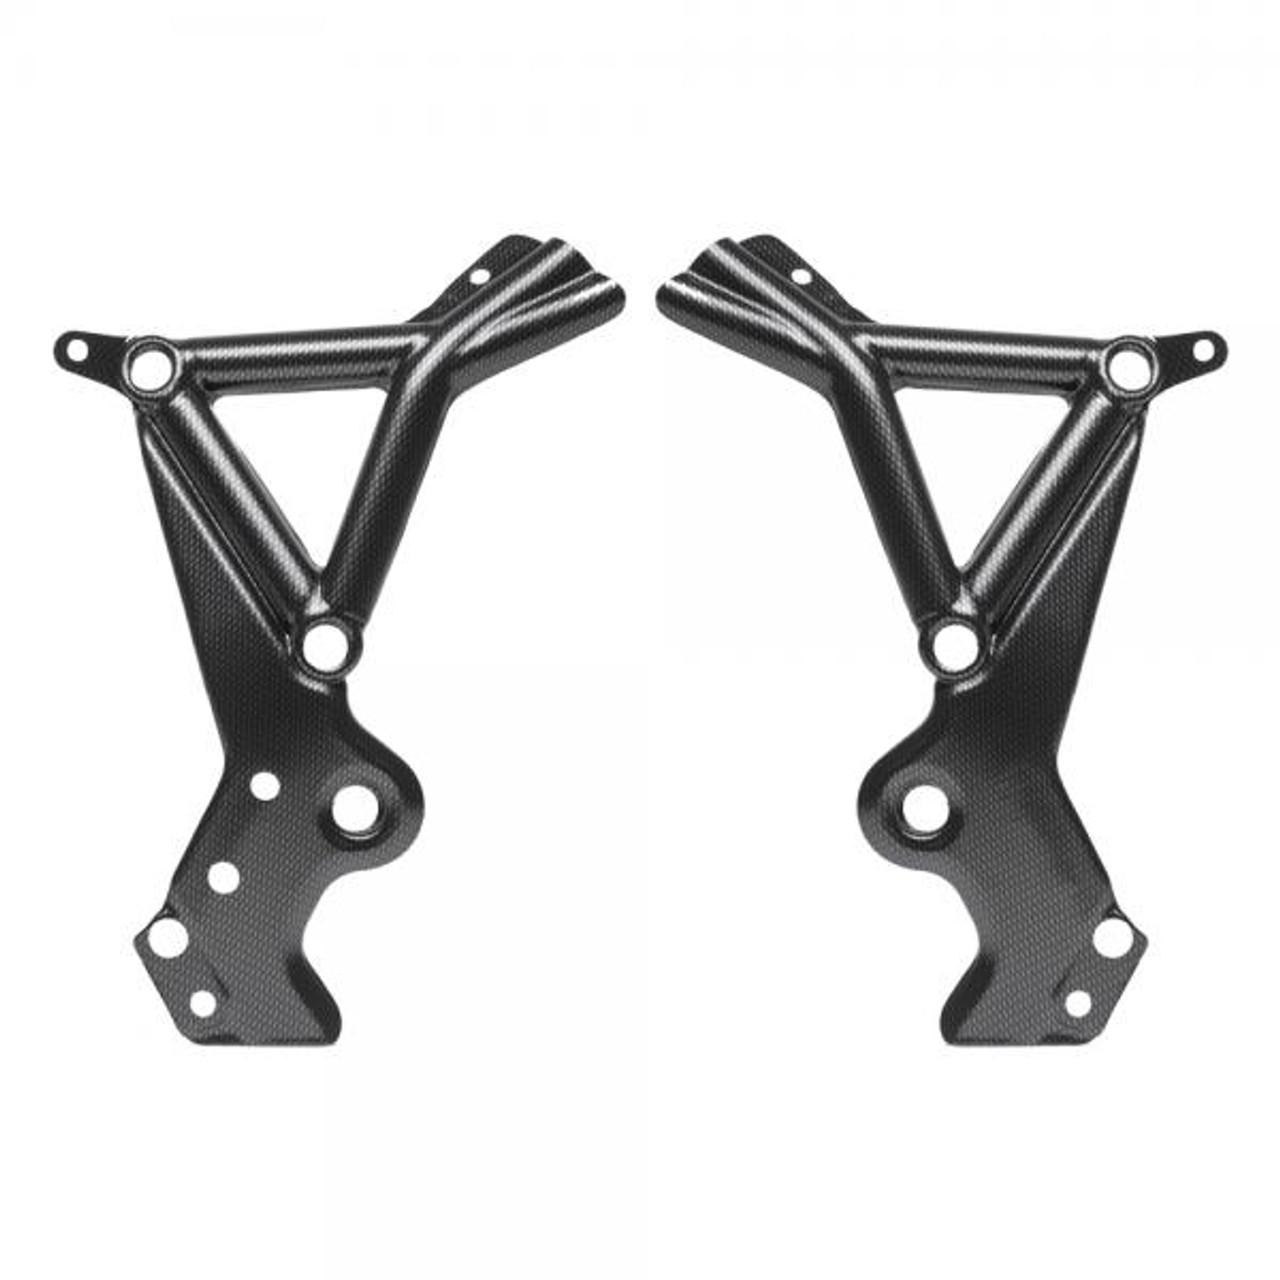 Carbon-look frame protectors - Vertigo